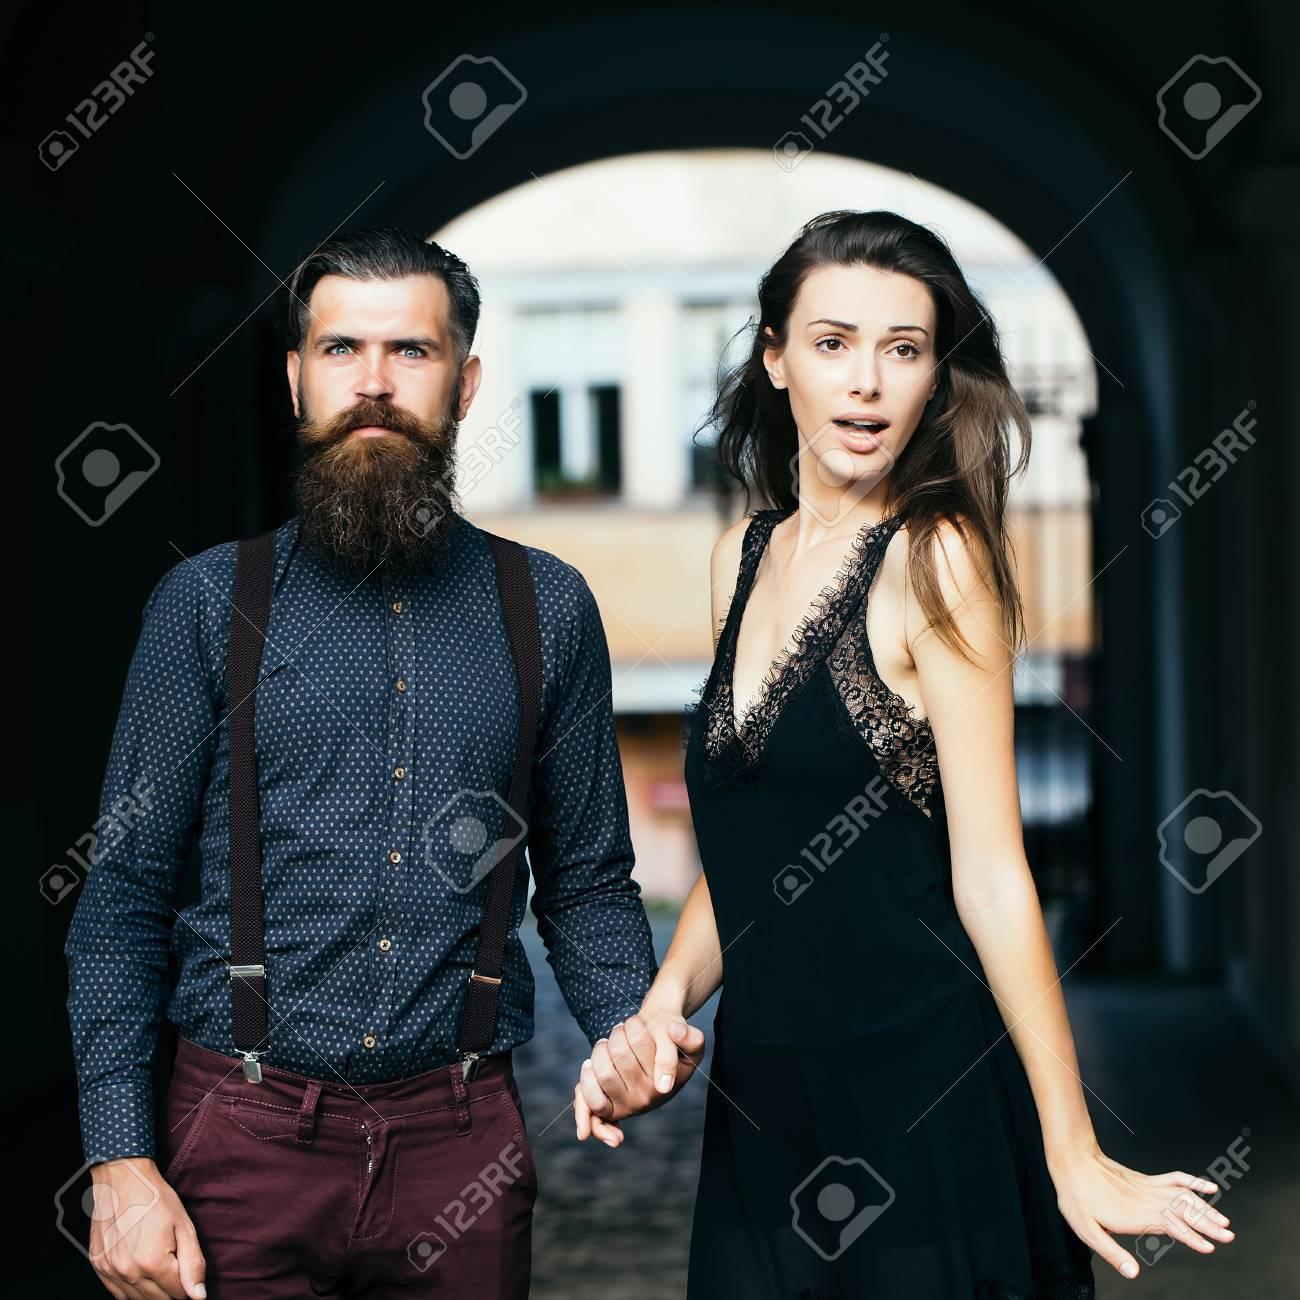 Grupo encanto tengo una muрів±eca vestida de azul